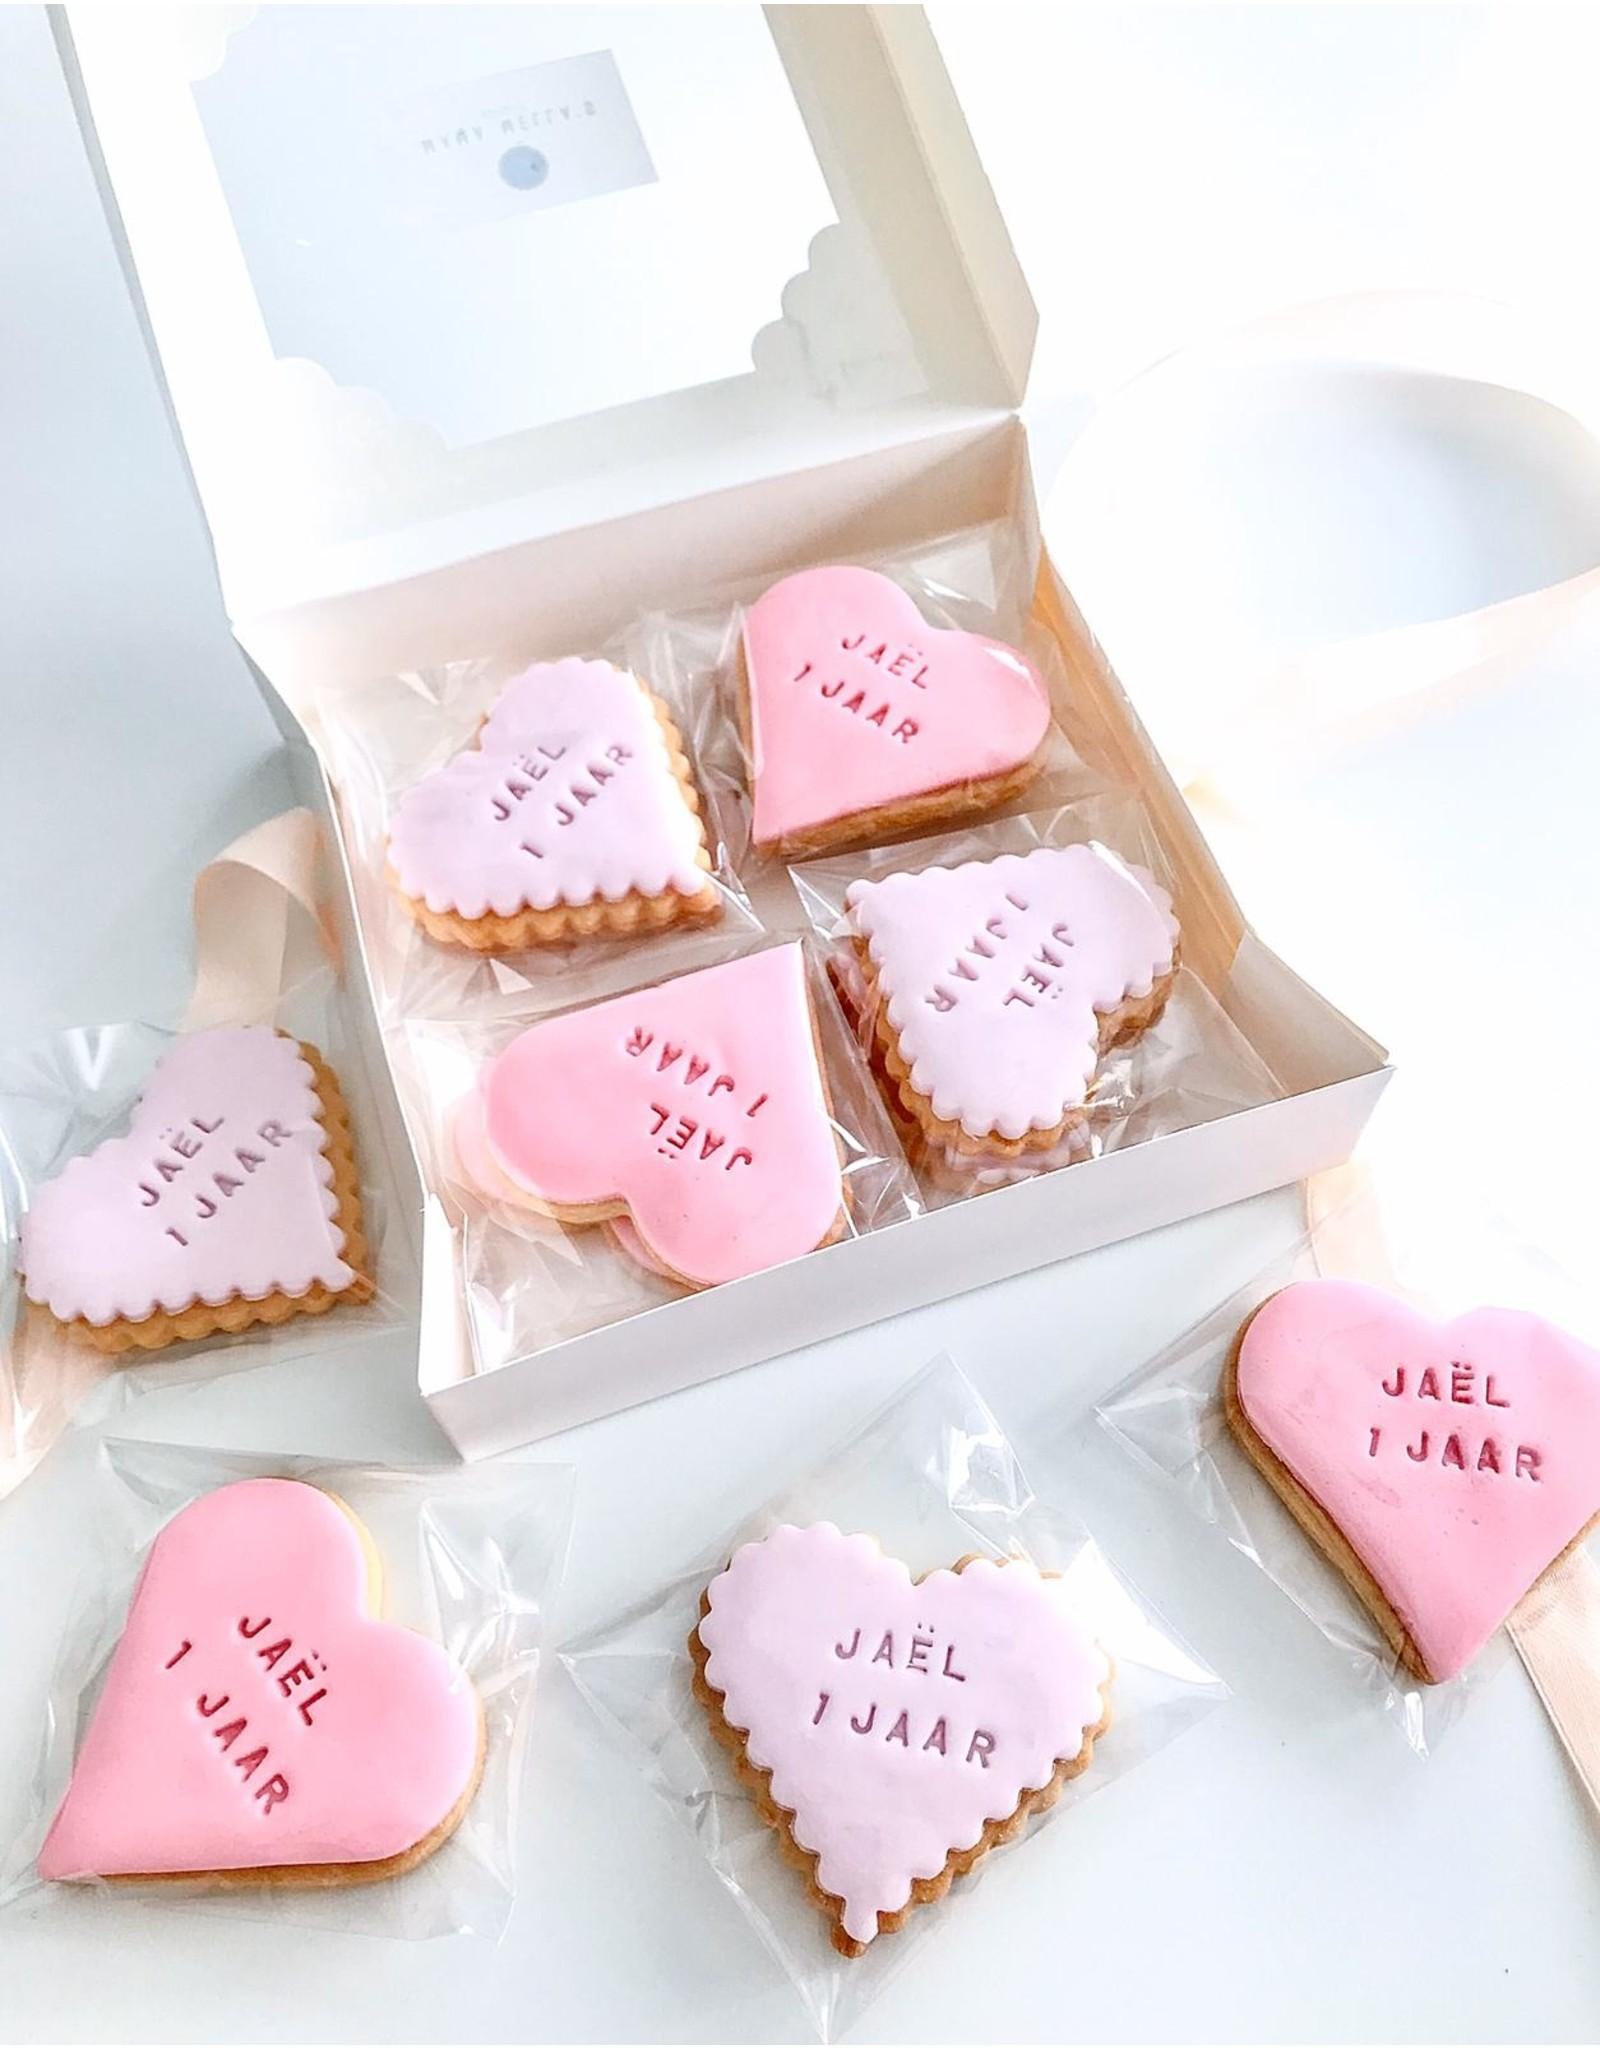 De slimme sweets box (per 100 stuks)